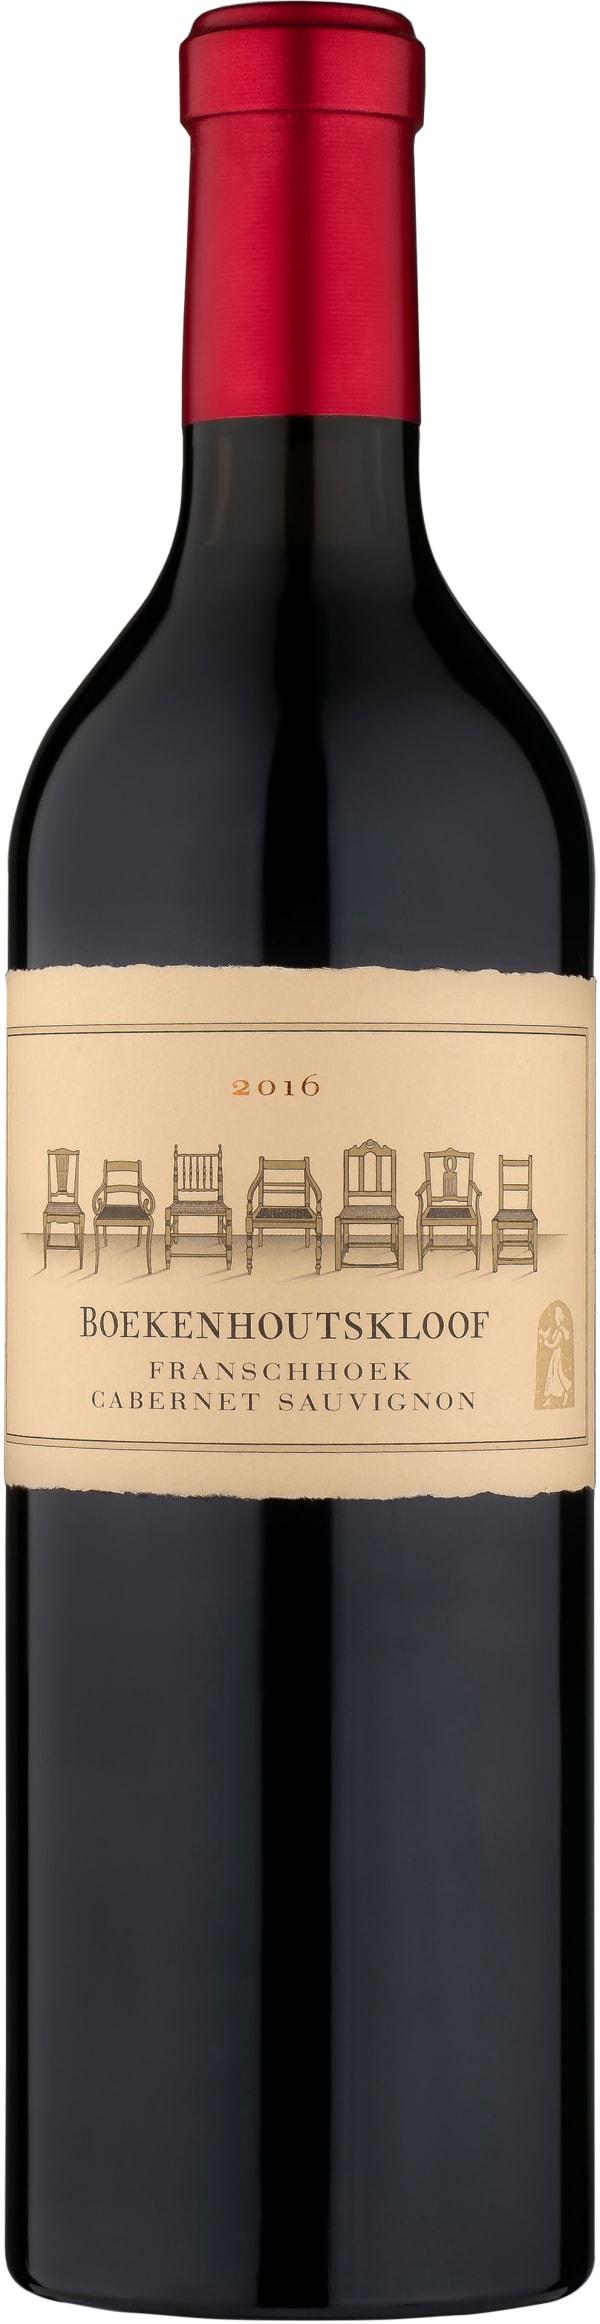 Boekenhoutskloof Franschhoek Cabernet Sauvignon 2016